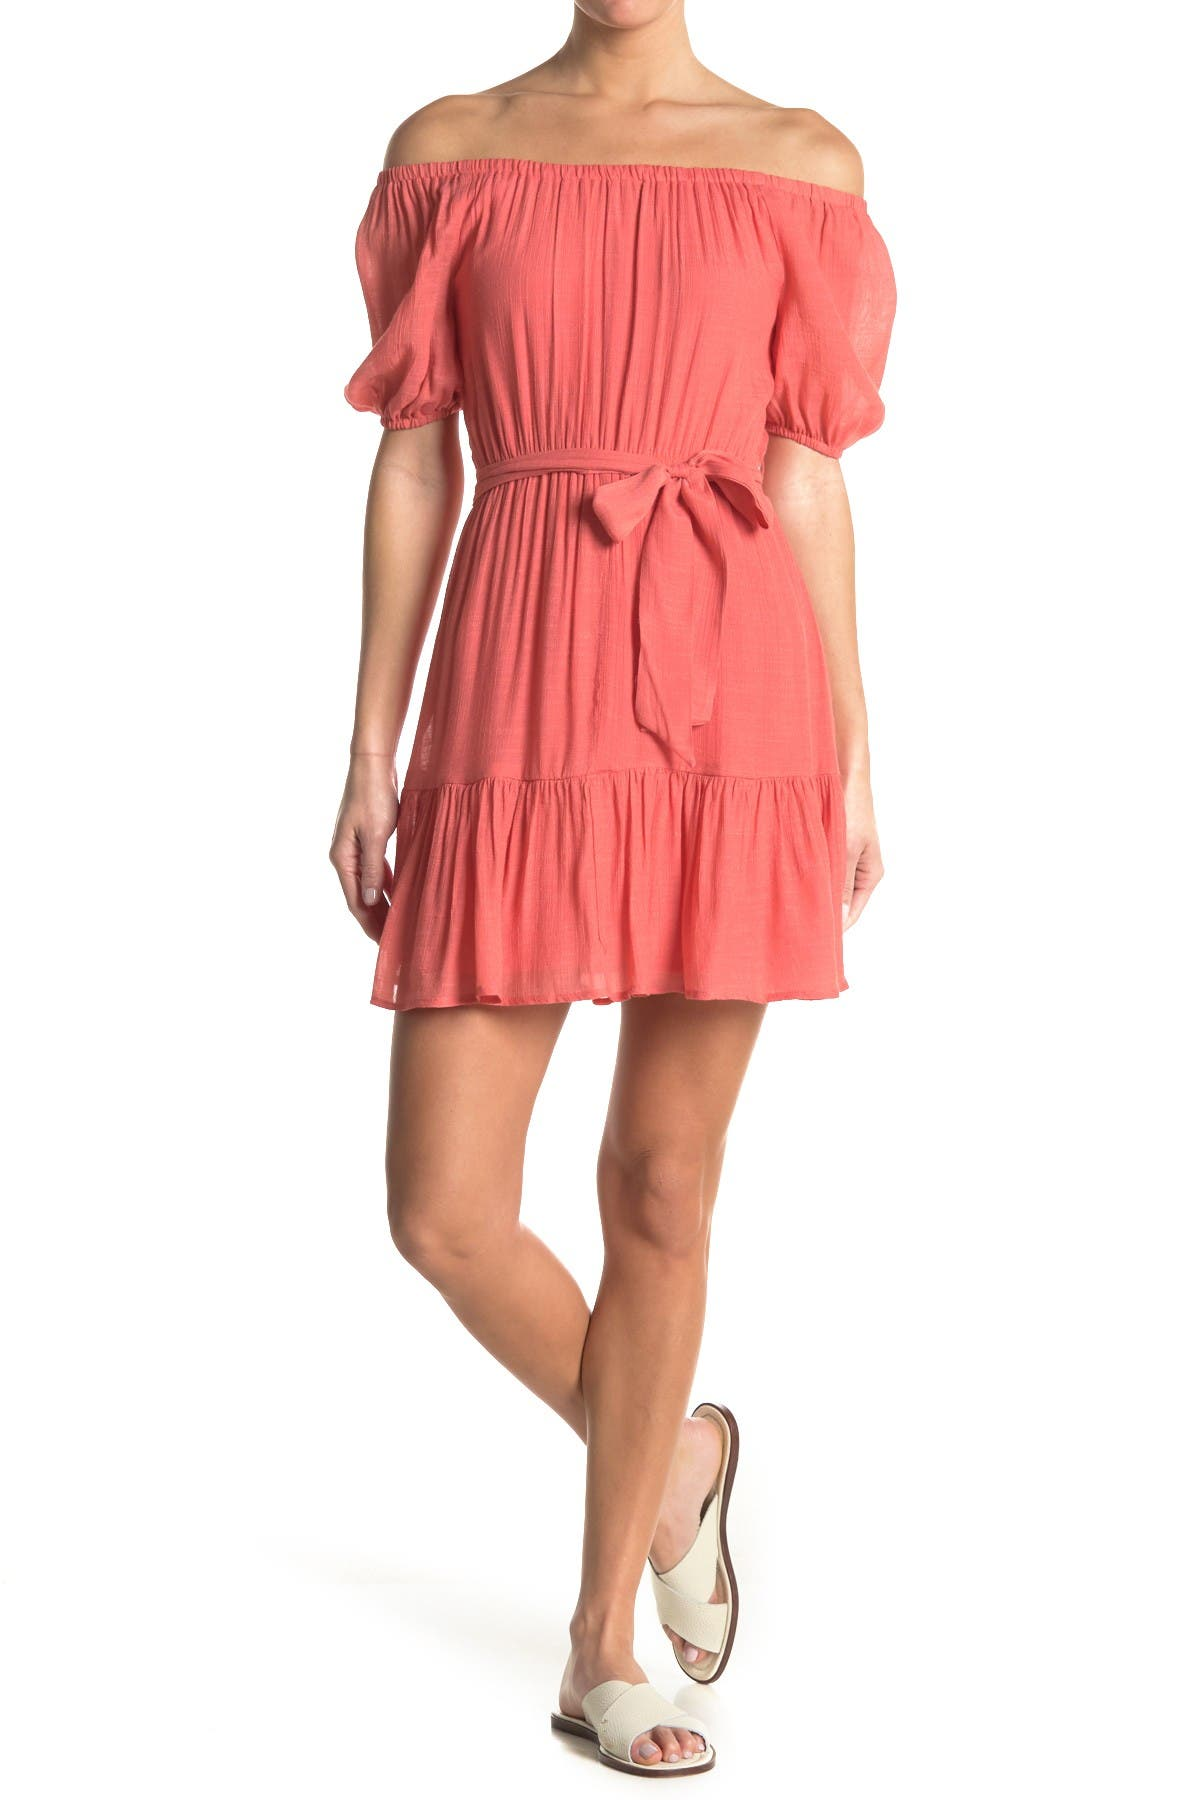 Image of KENEDIK Off-the-Shoulder Puff Sleeve Ruffled MIni Dress